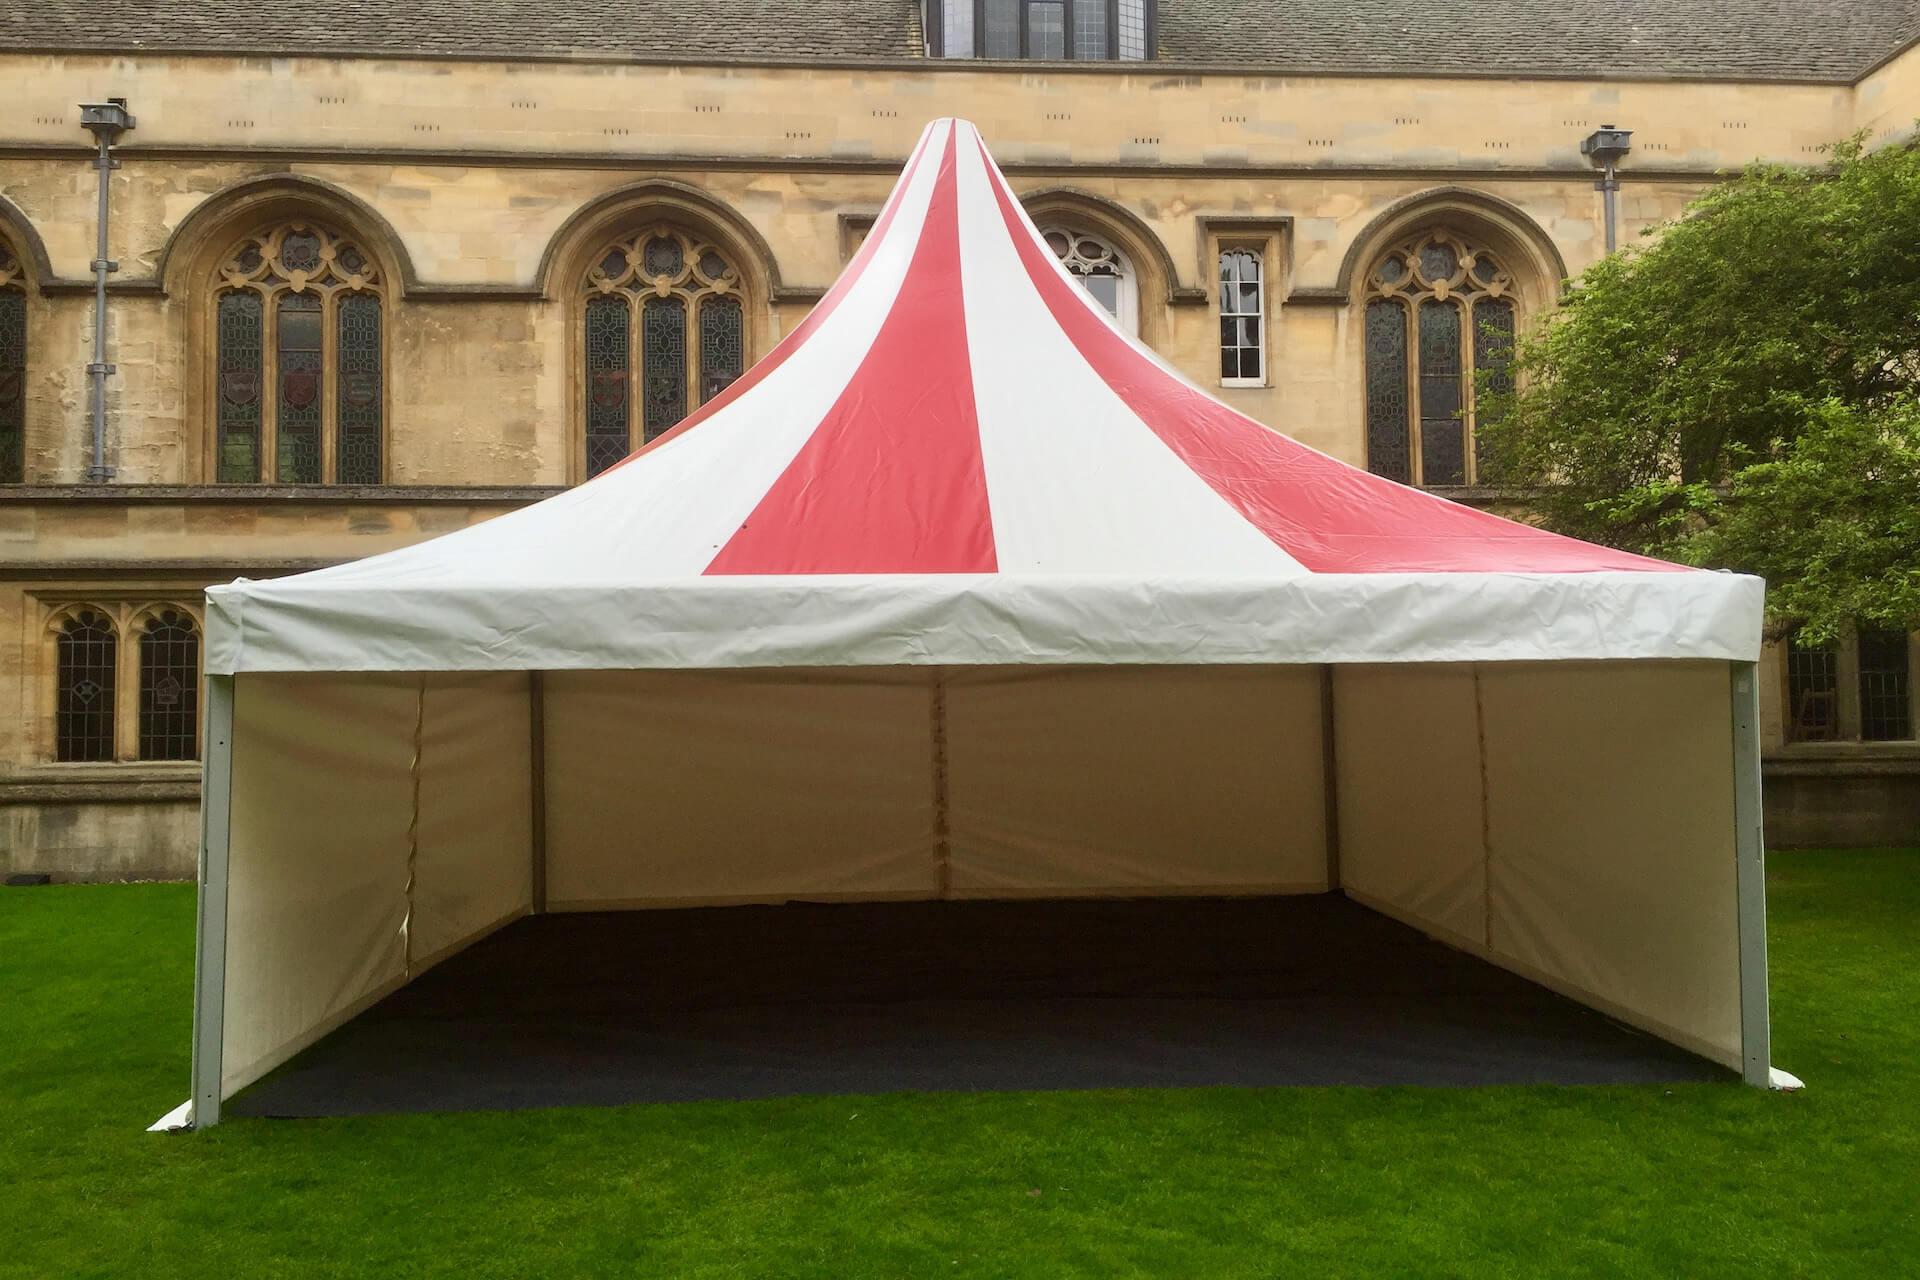 Square pagoda tent at university student ball